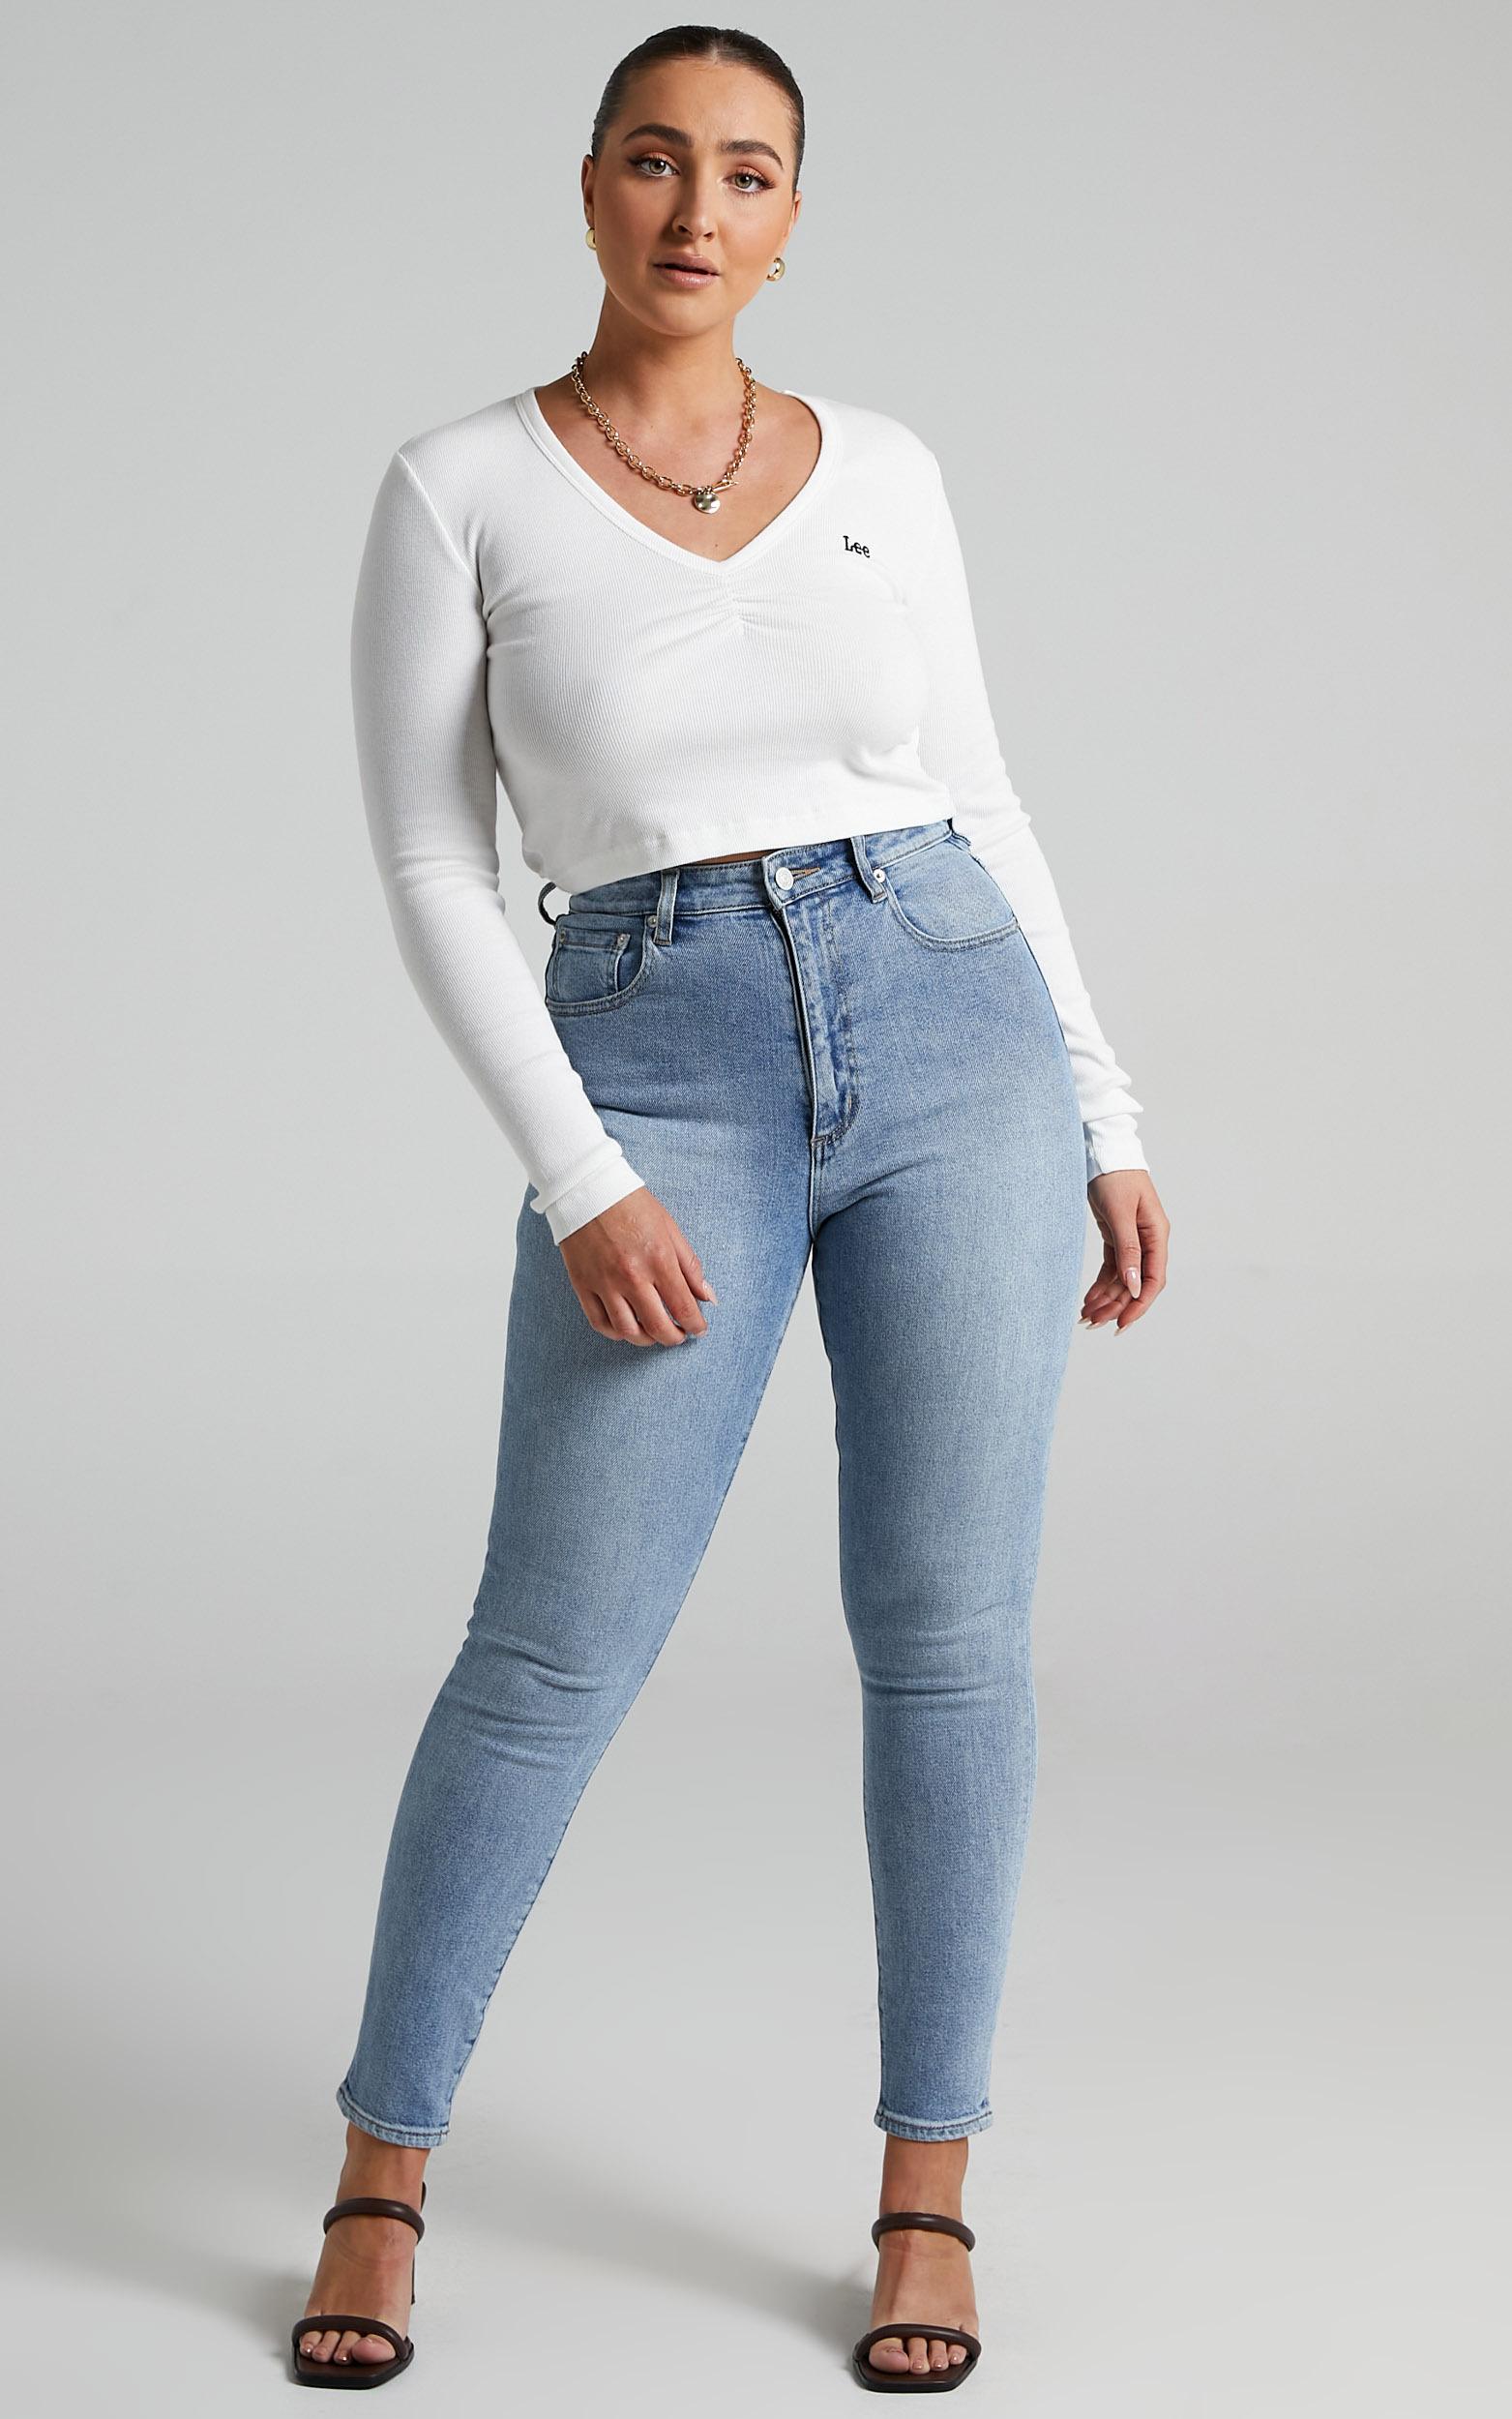 Lee - High Licks Cropped Jeans in Spirit - 06, BLU1, hi-res image number null